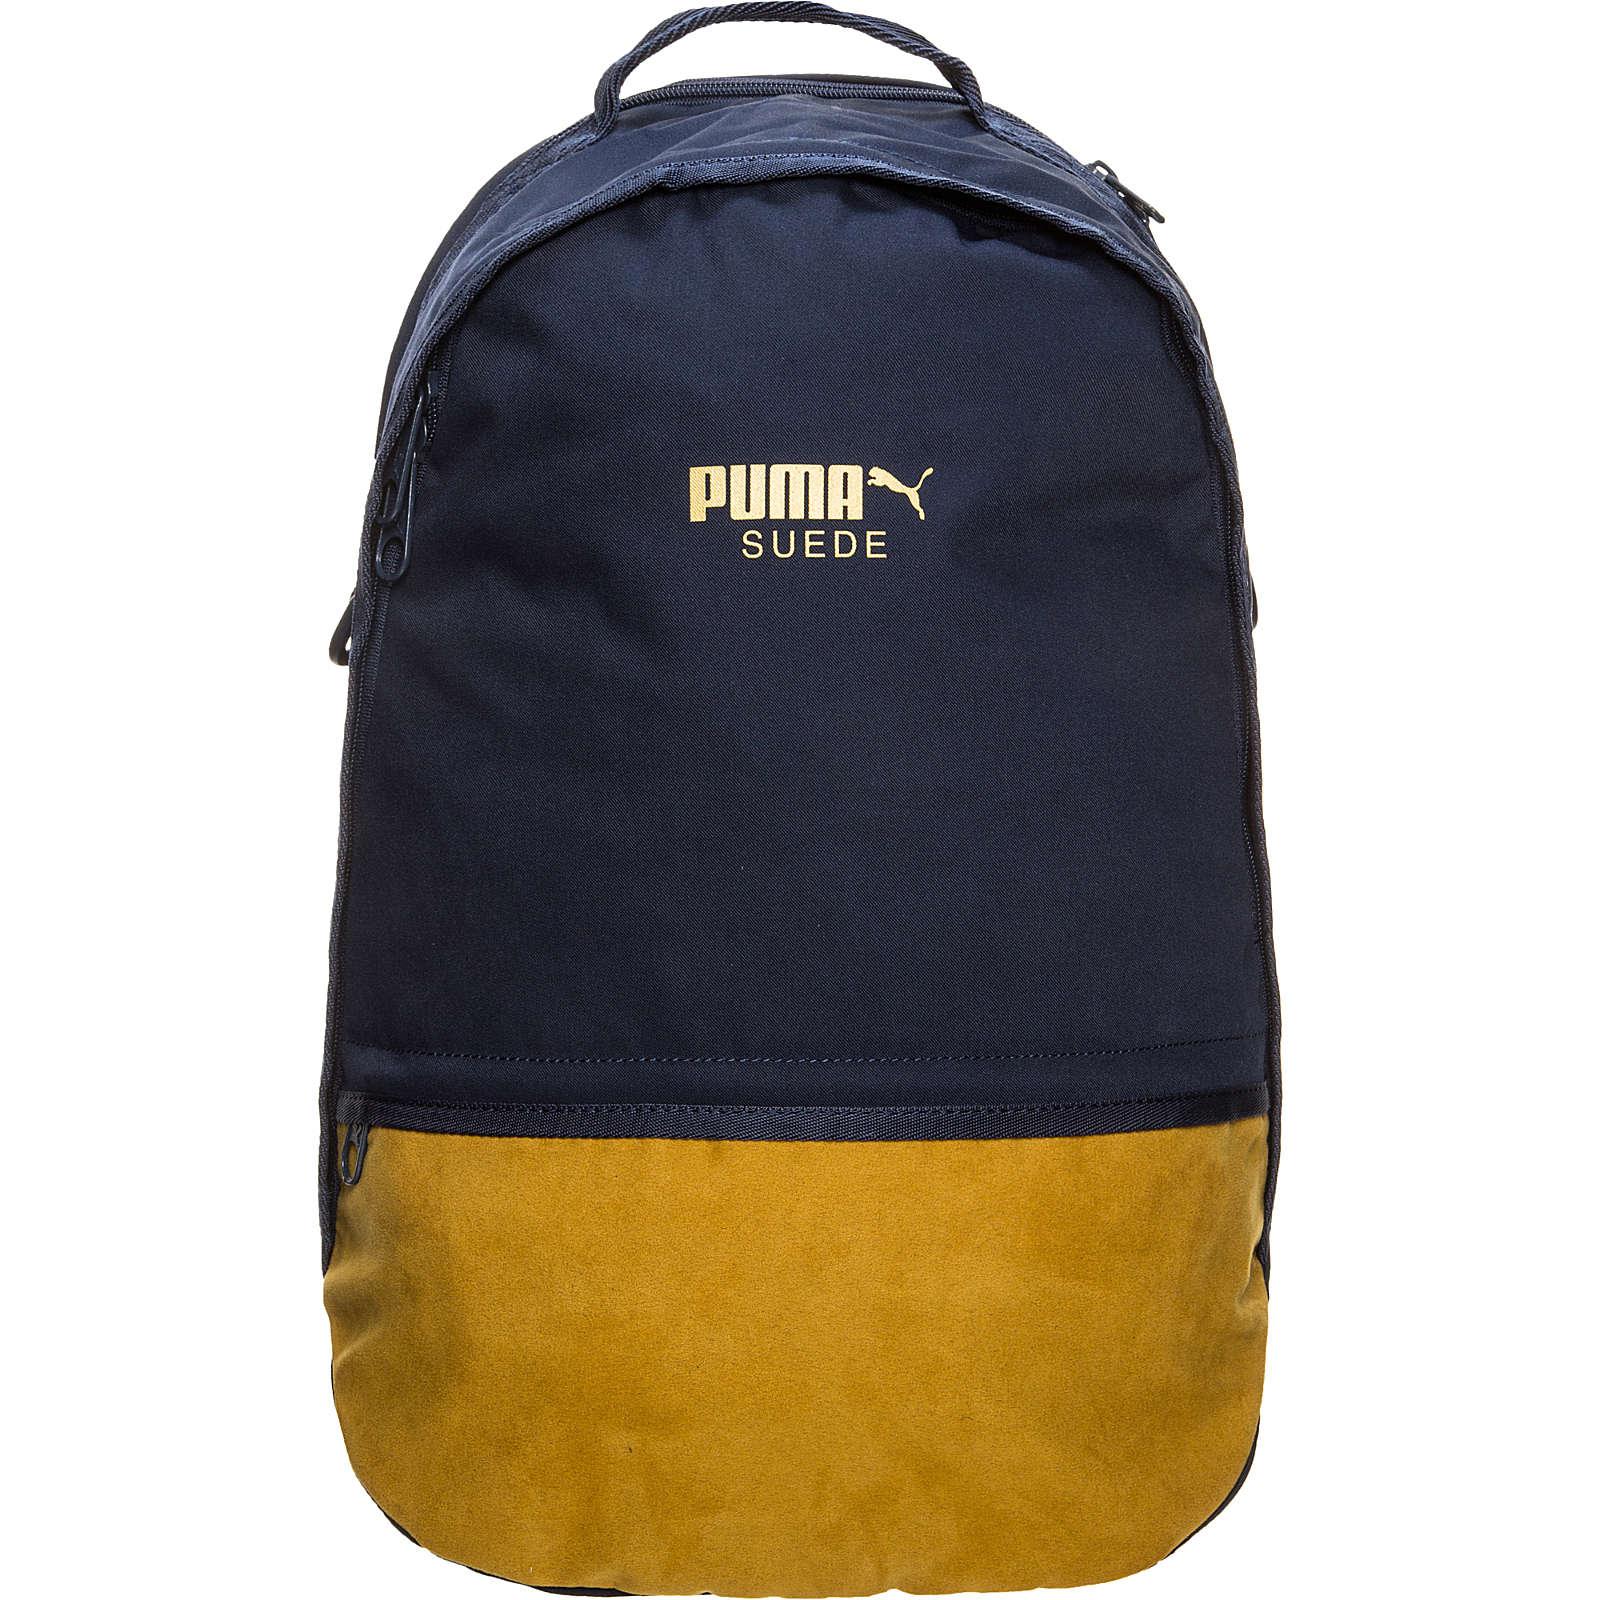 Sportrucksäcke Puma Suede blau/gelb